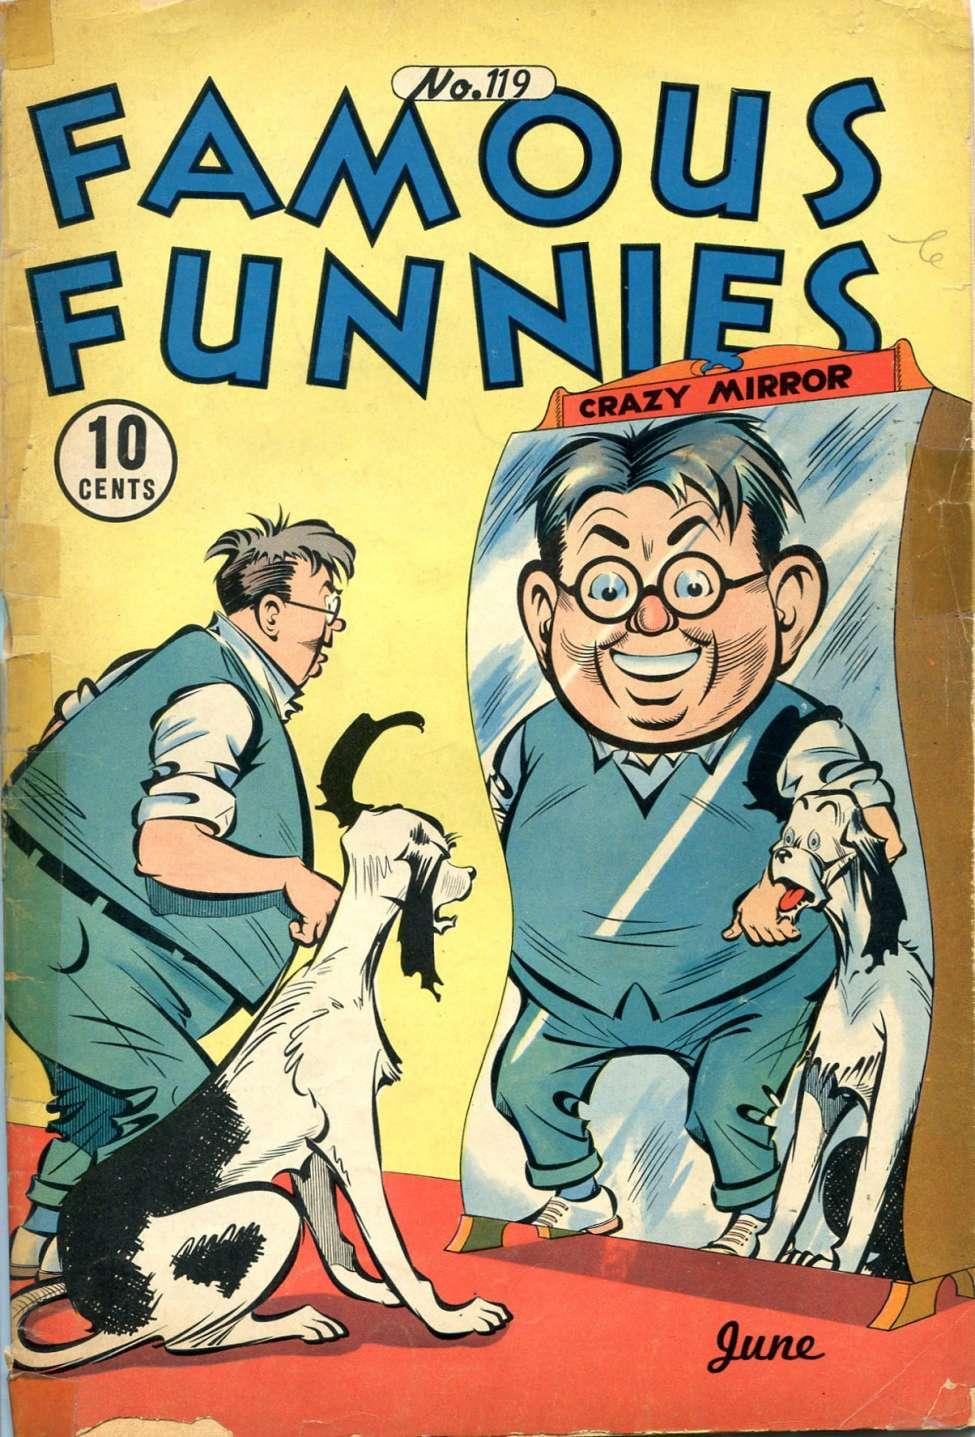 Free vintage clip art of rabbits